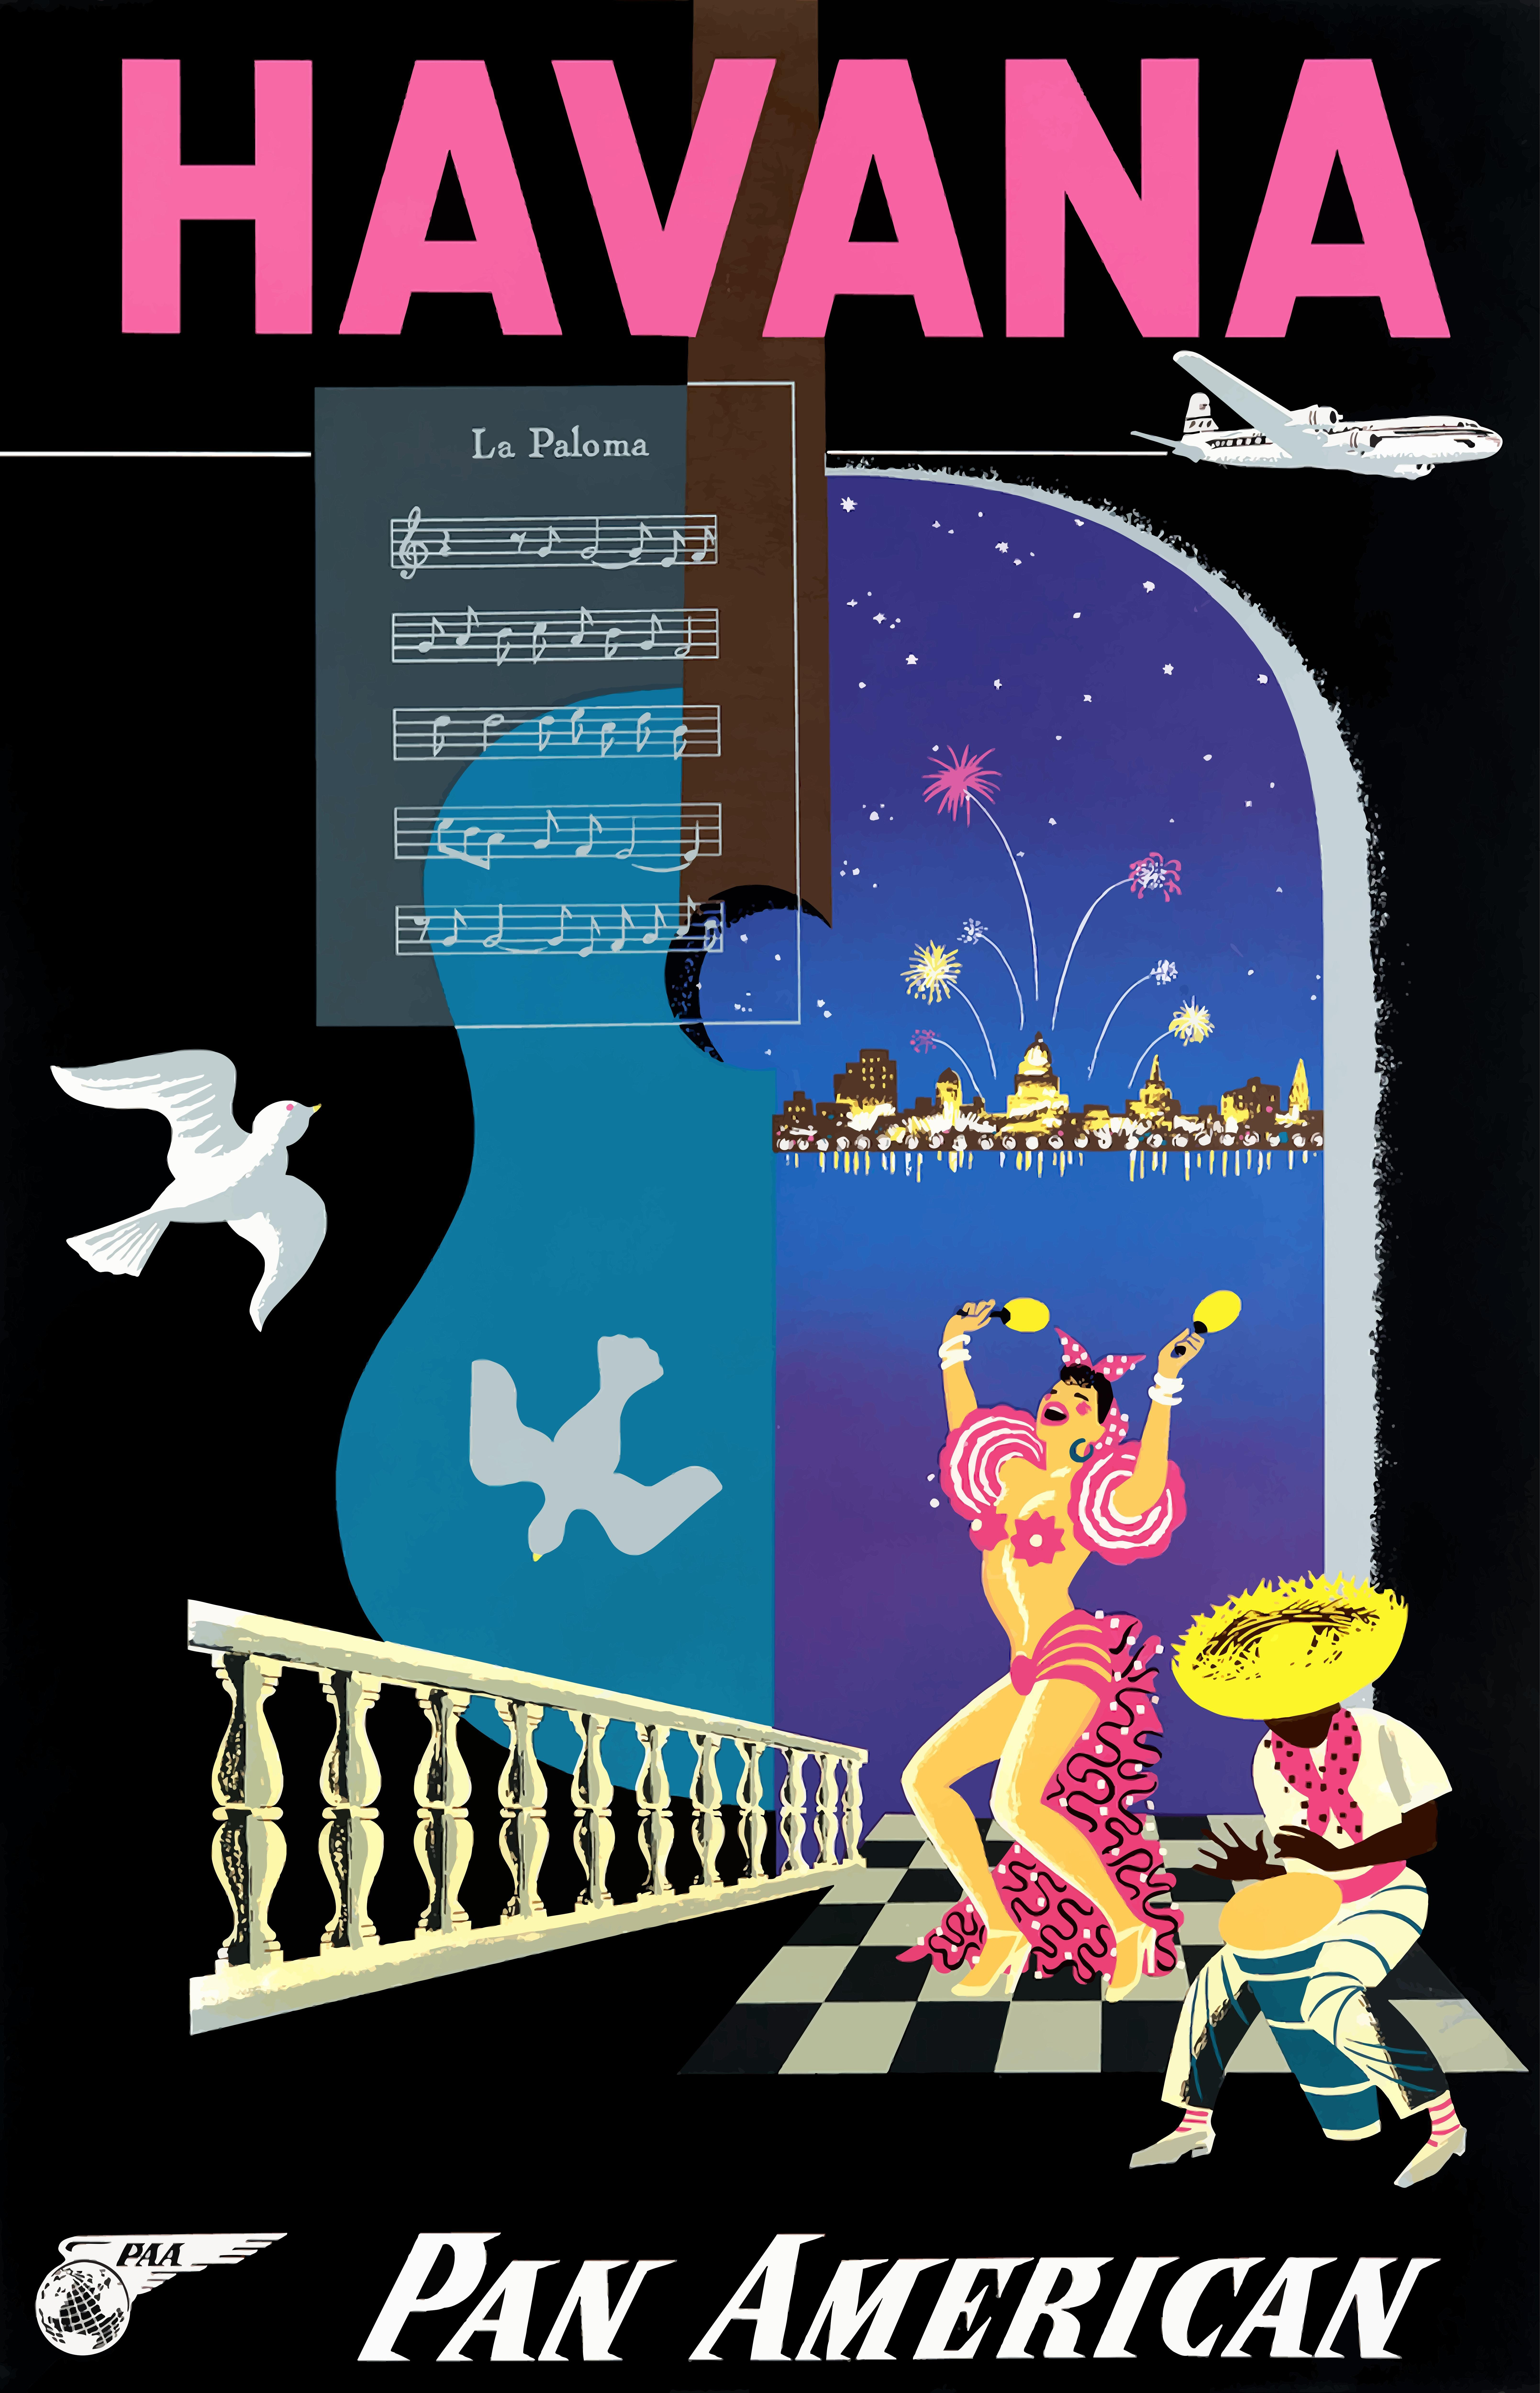 Fly to Gay Havana Habana Cuba Cuban Caribbean Travel Advertisement Poster